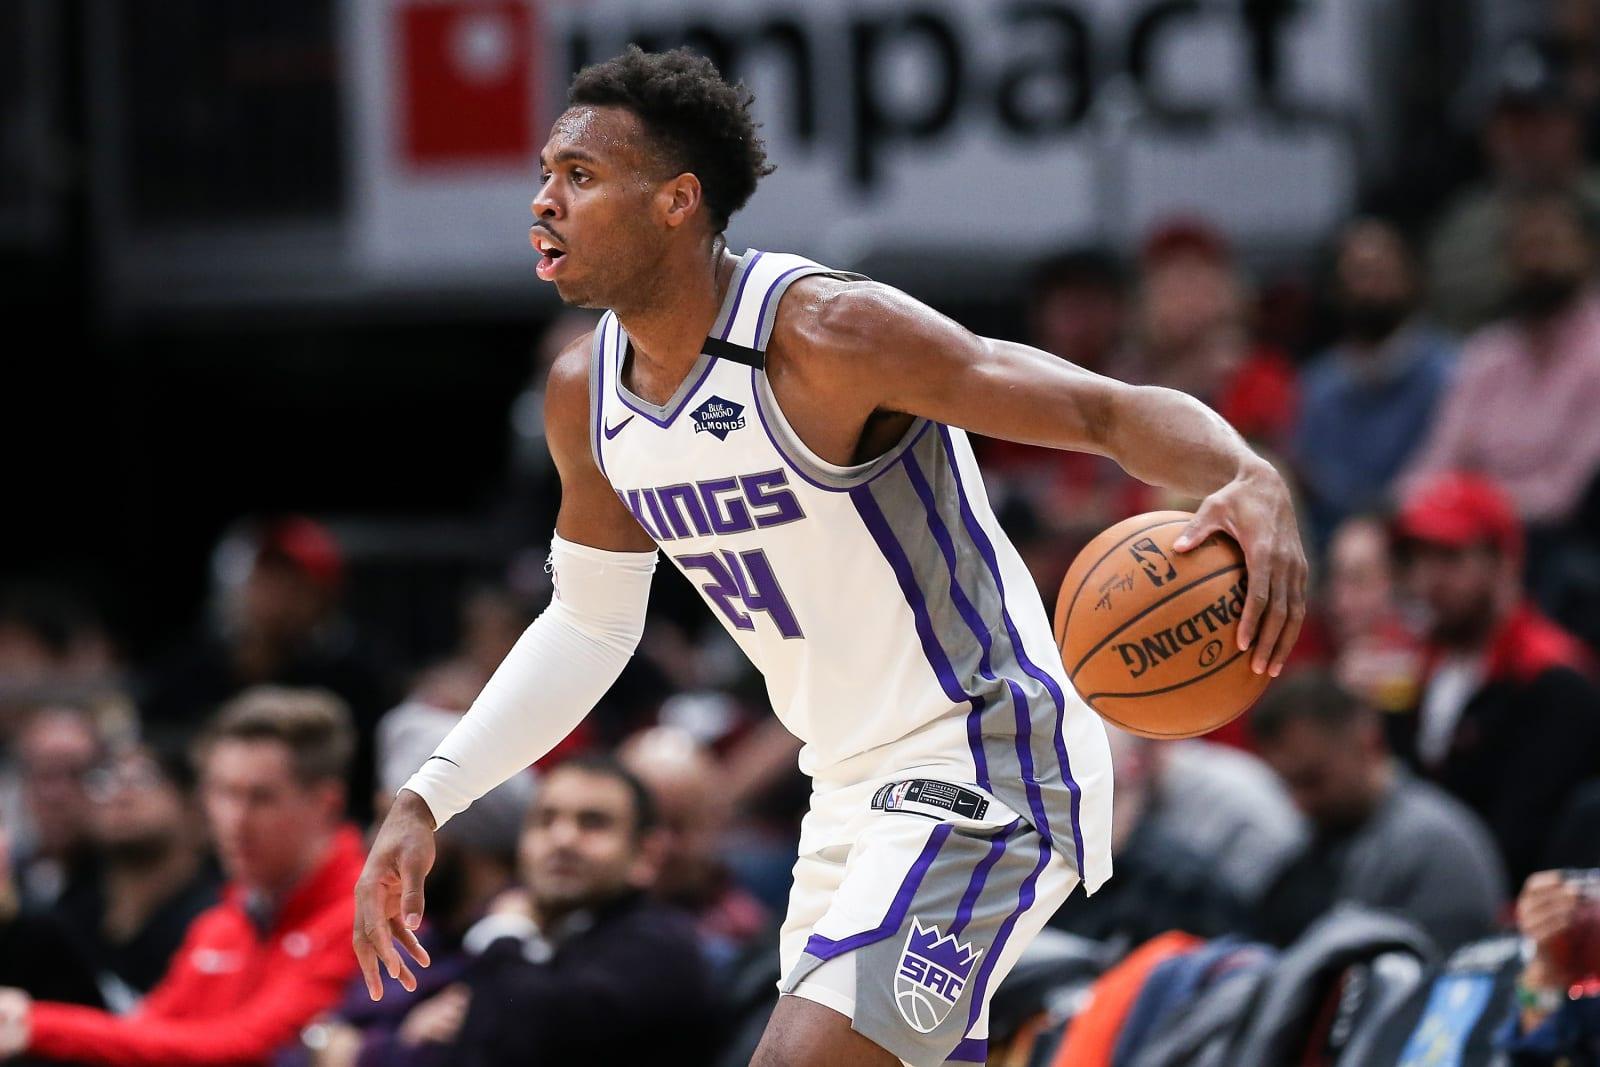 NBA, Sacramento Kings: Buddy Hield